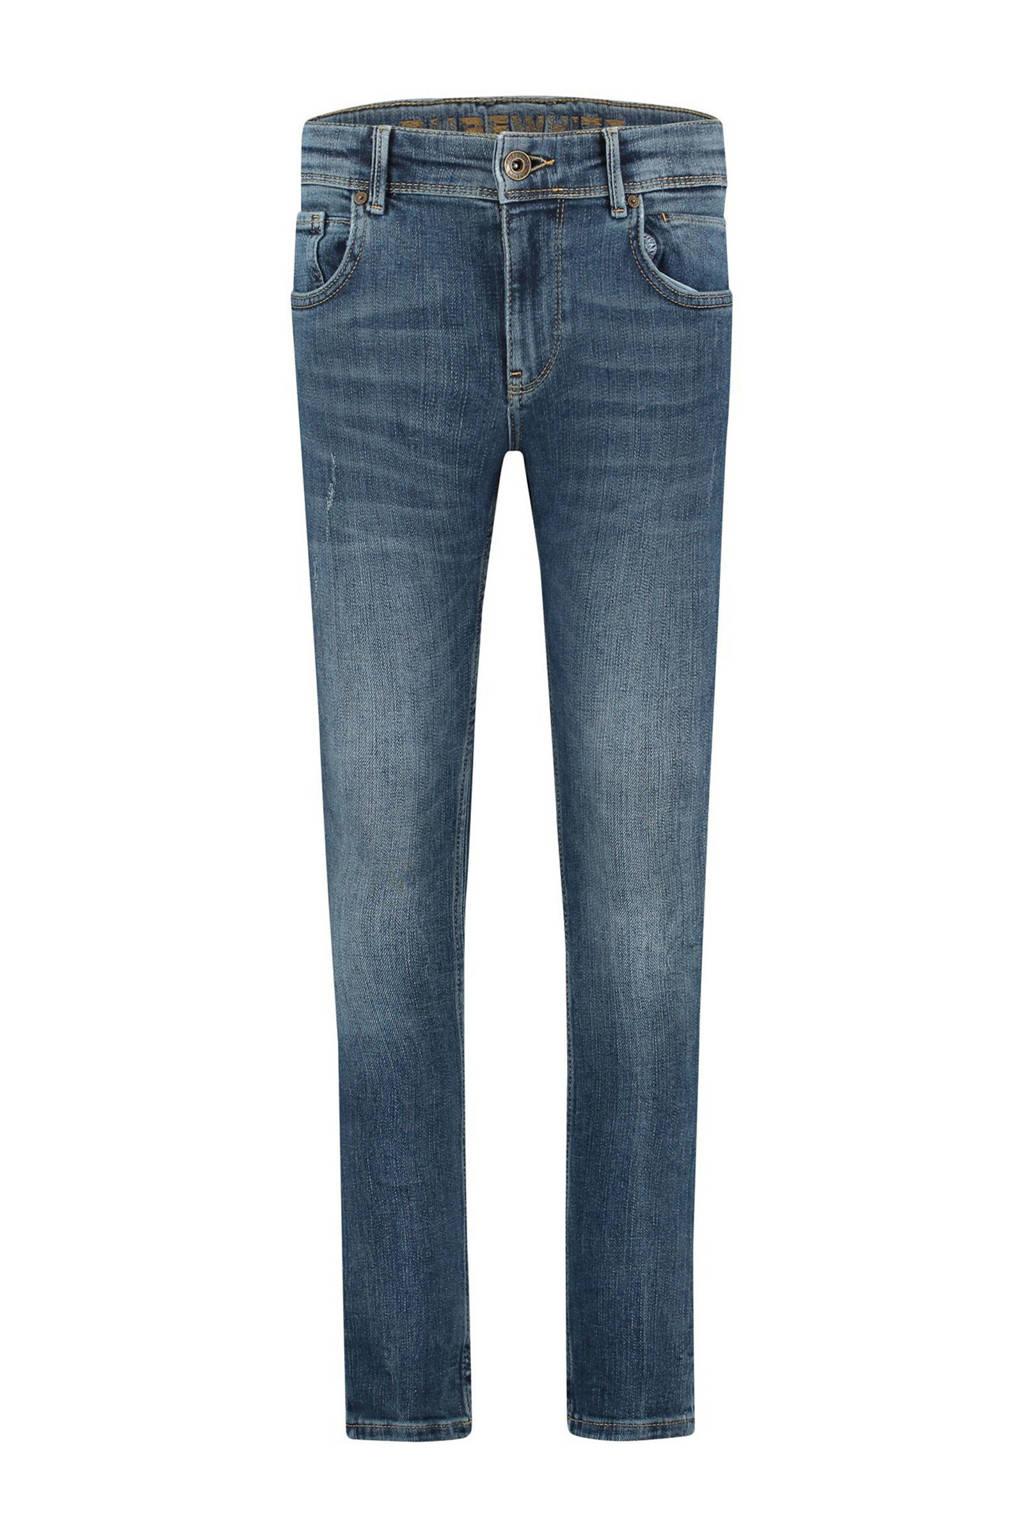 Ballin skinny jeans Jeans Pure White blauw, Blauw